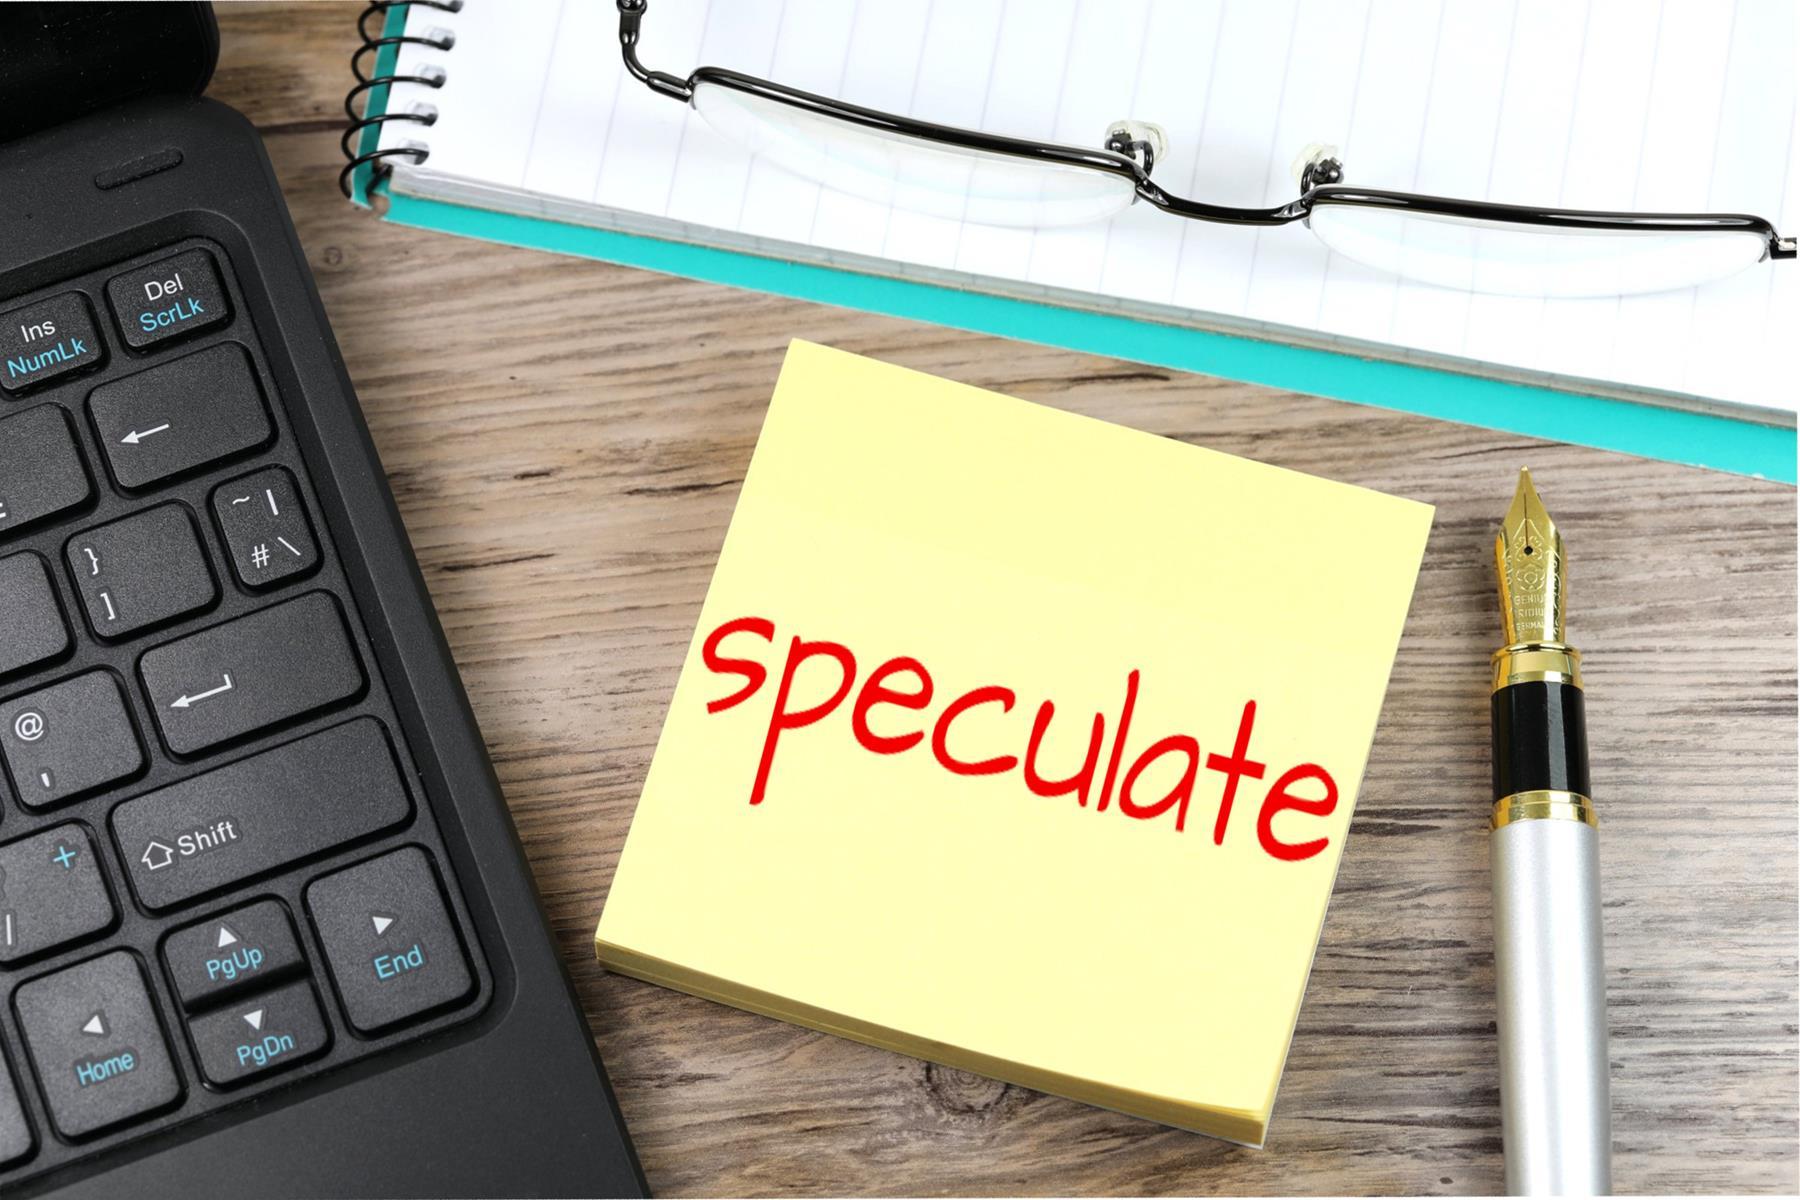 Speculate